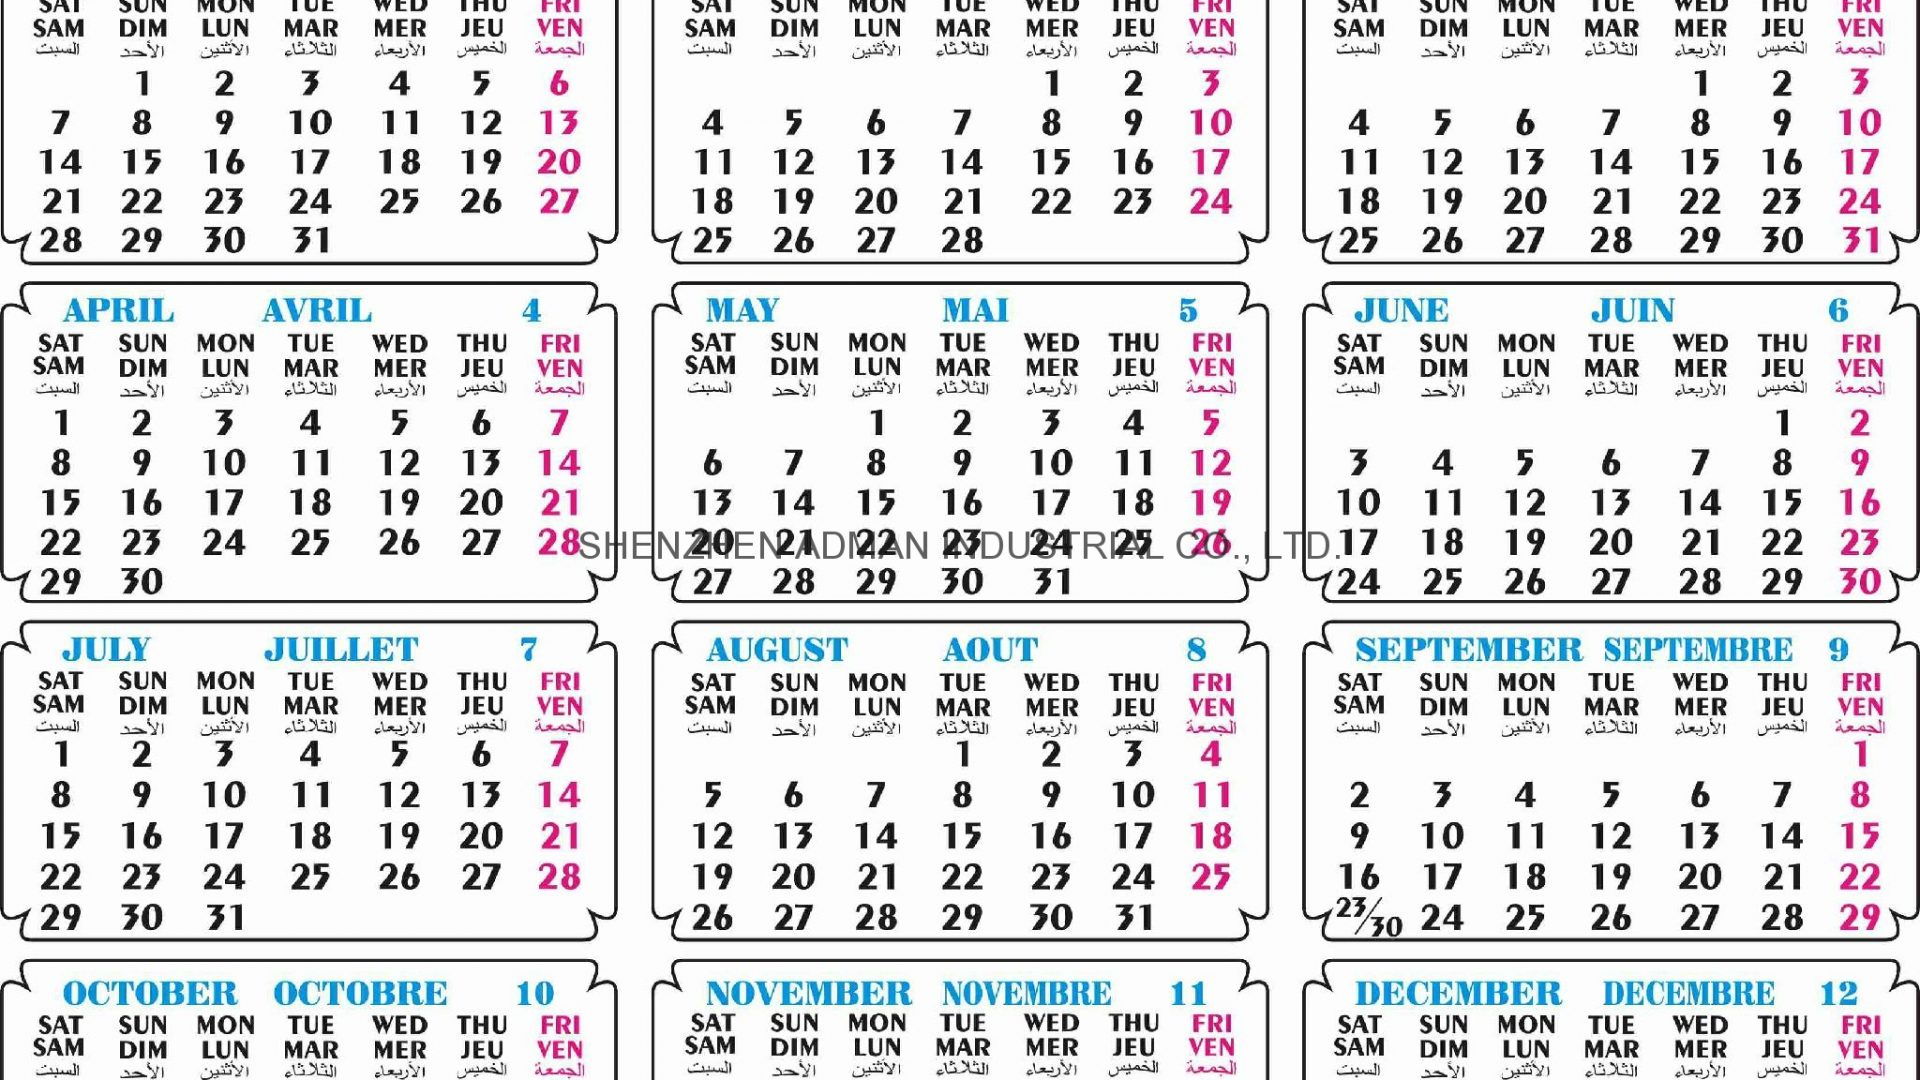 Calendar Wallpaper March : March calendar wallpaper wallpapers adorable